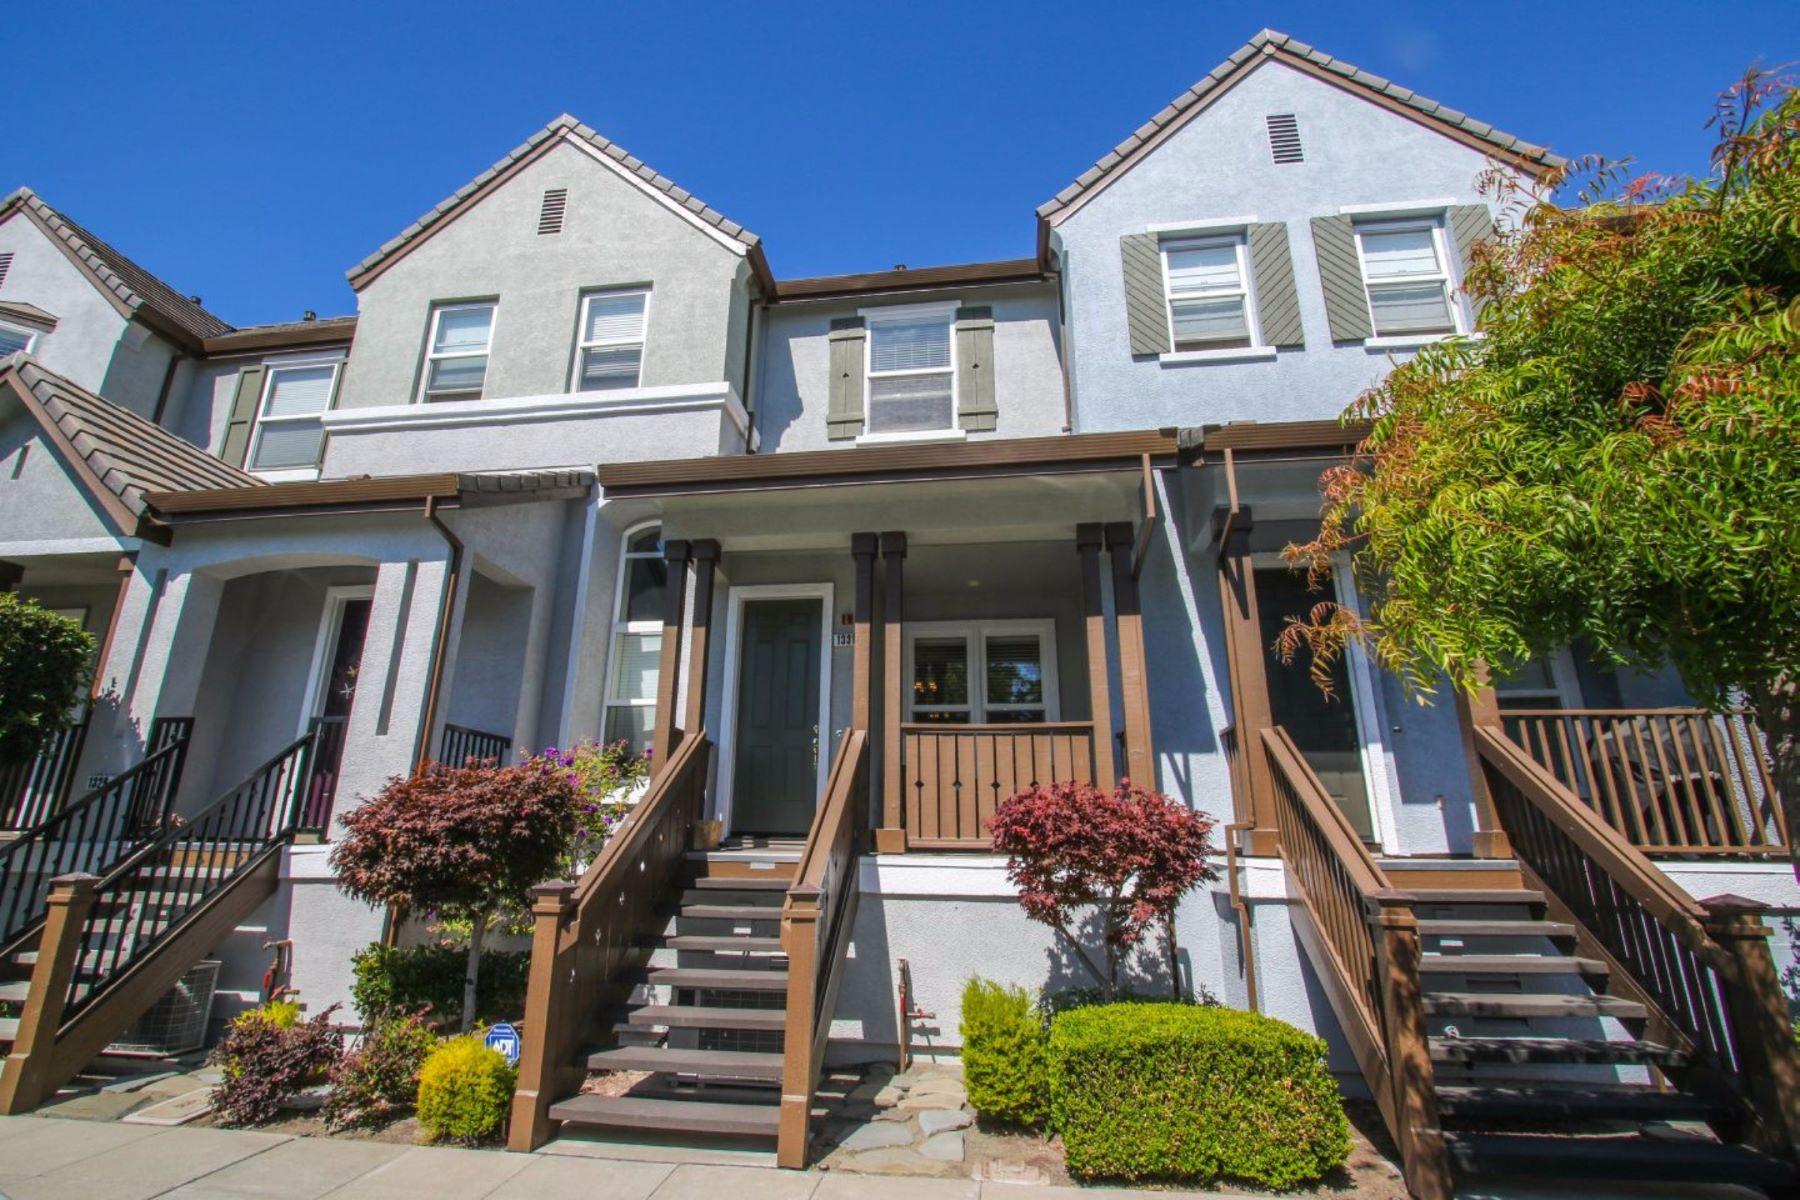 Townhouse for Sale at 1331 Wayne Way San Mateo, California 94403 United States